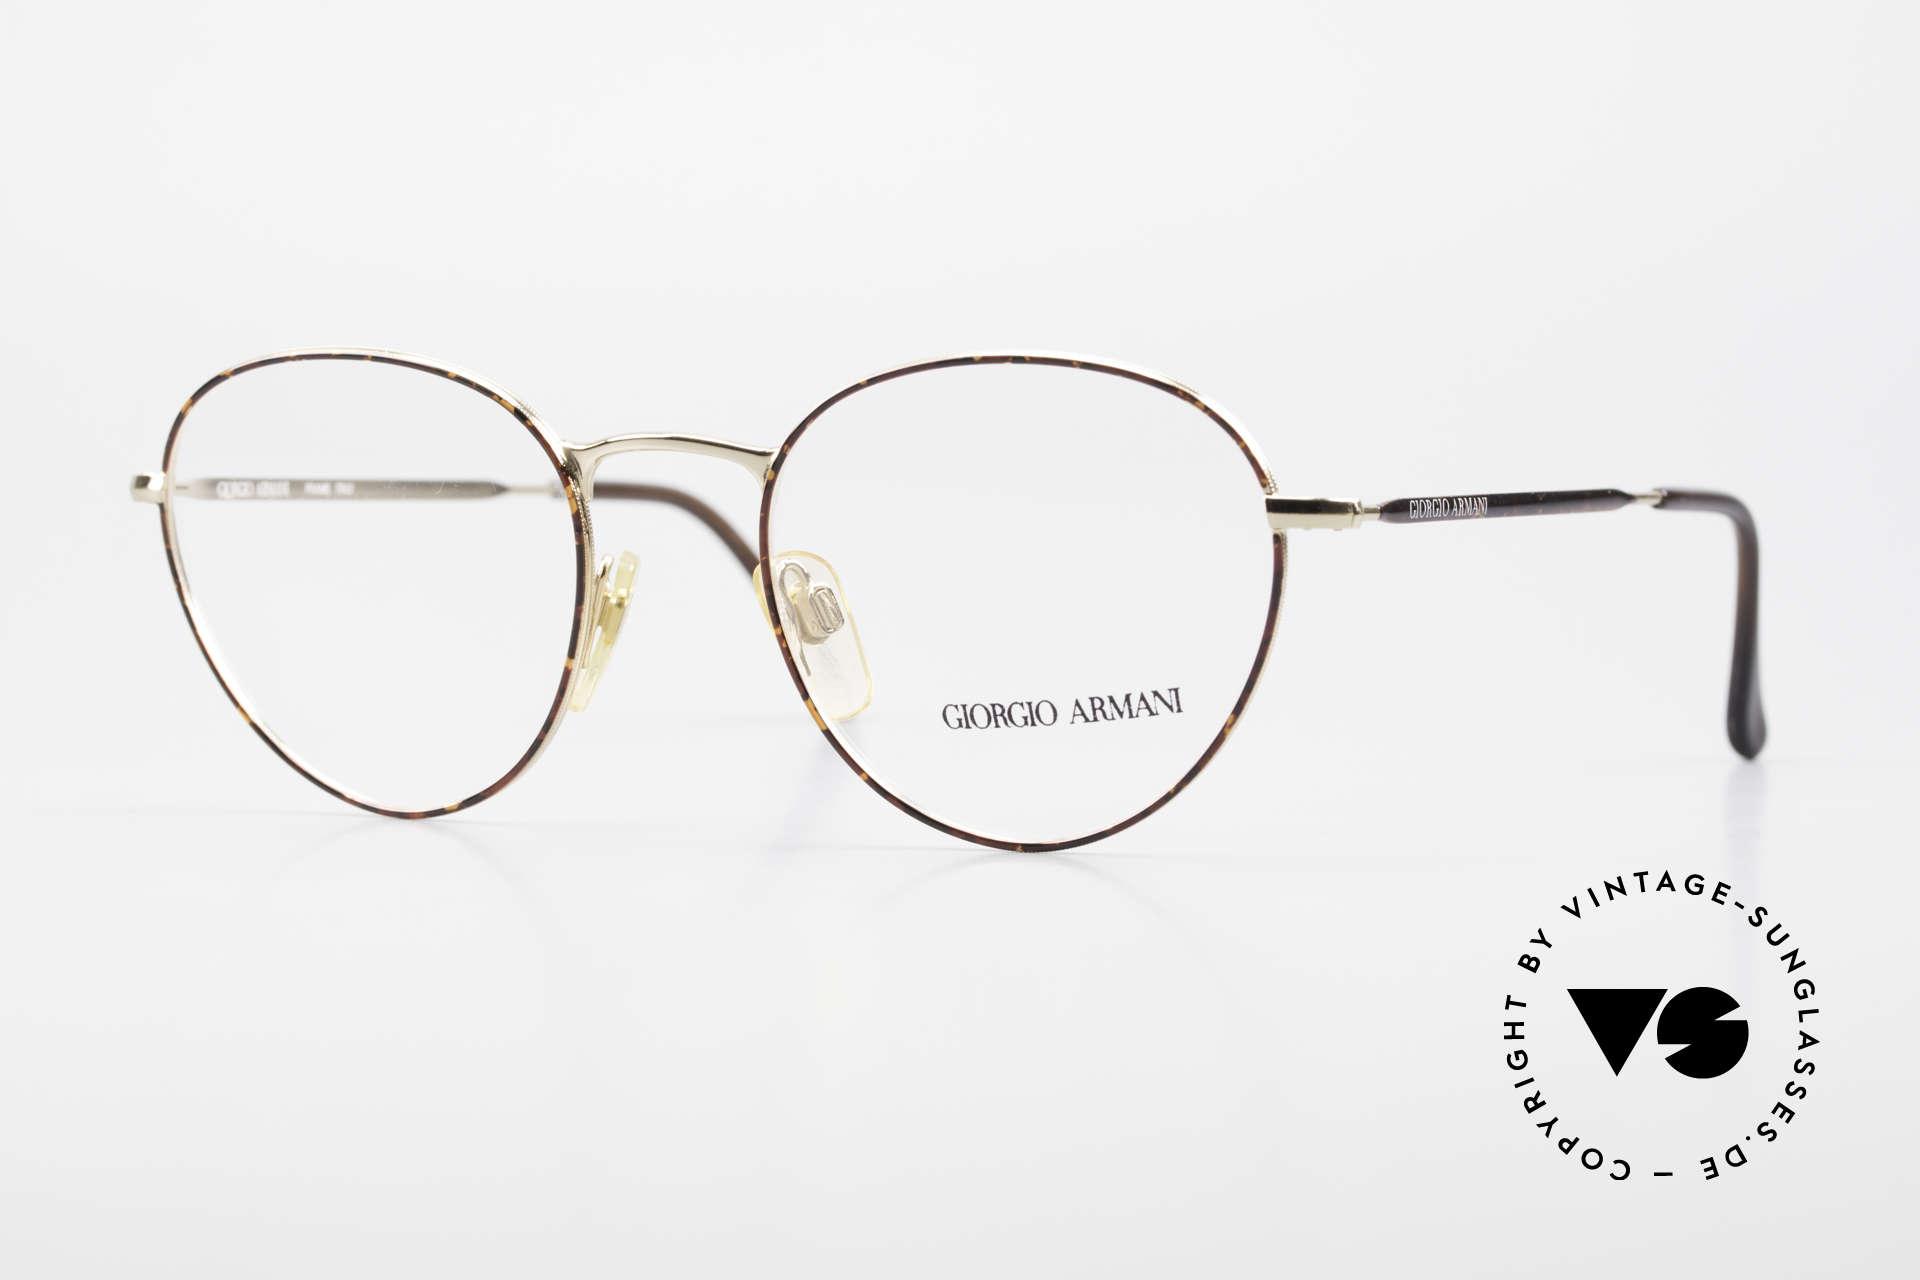 Giorgio Armani 165 Panto Vintage Glasses 80s 90s, world famous 'panto'-design .. a real eyewear classic, Made for Men